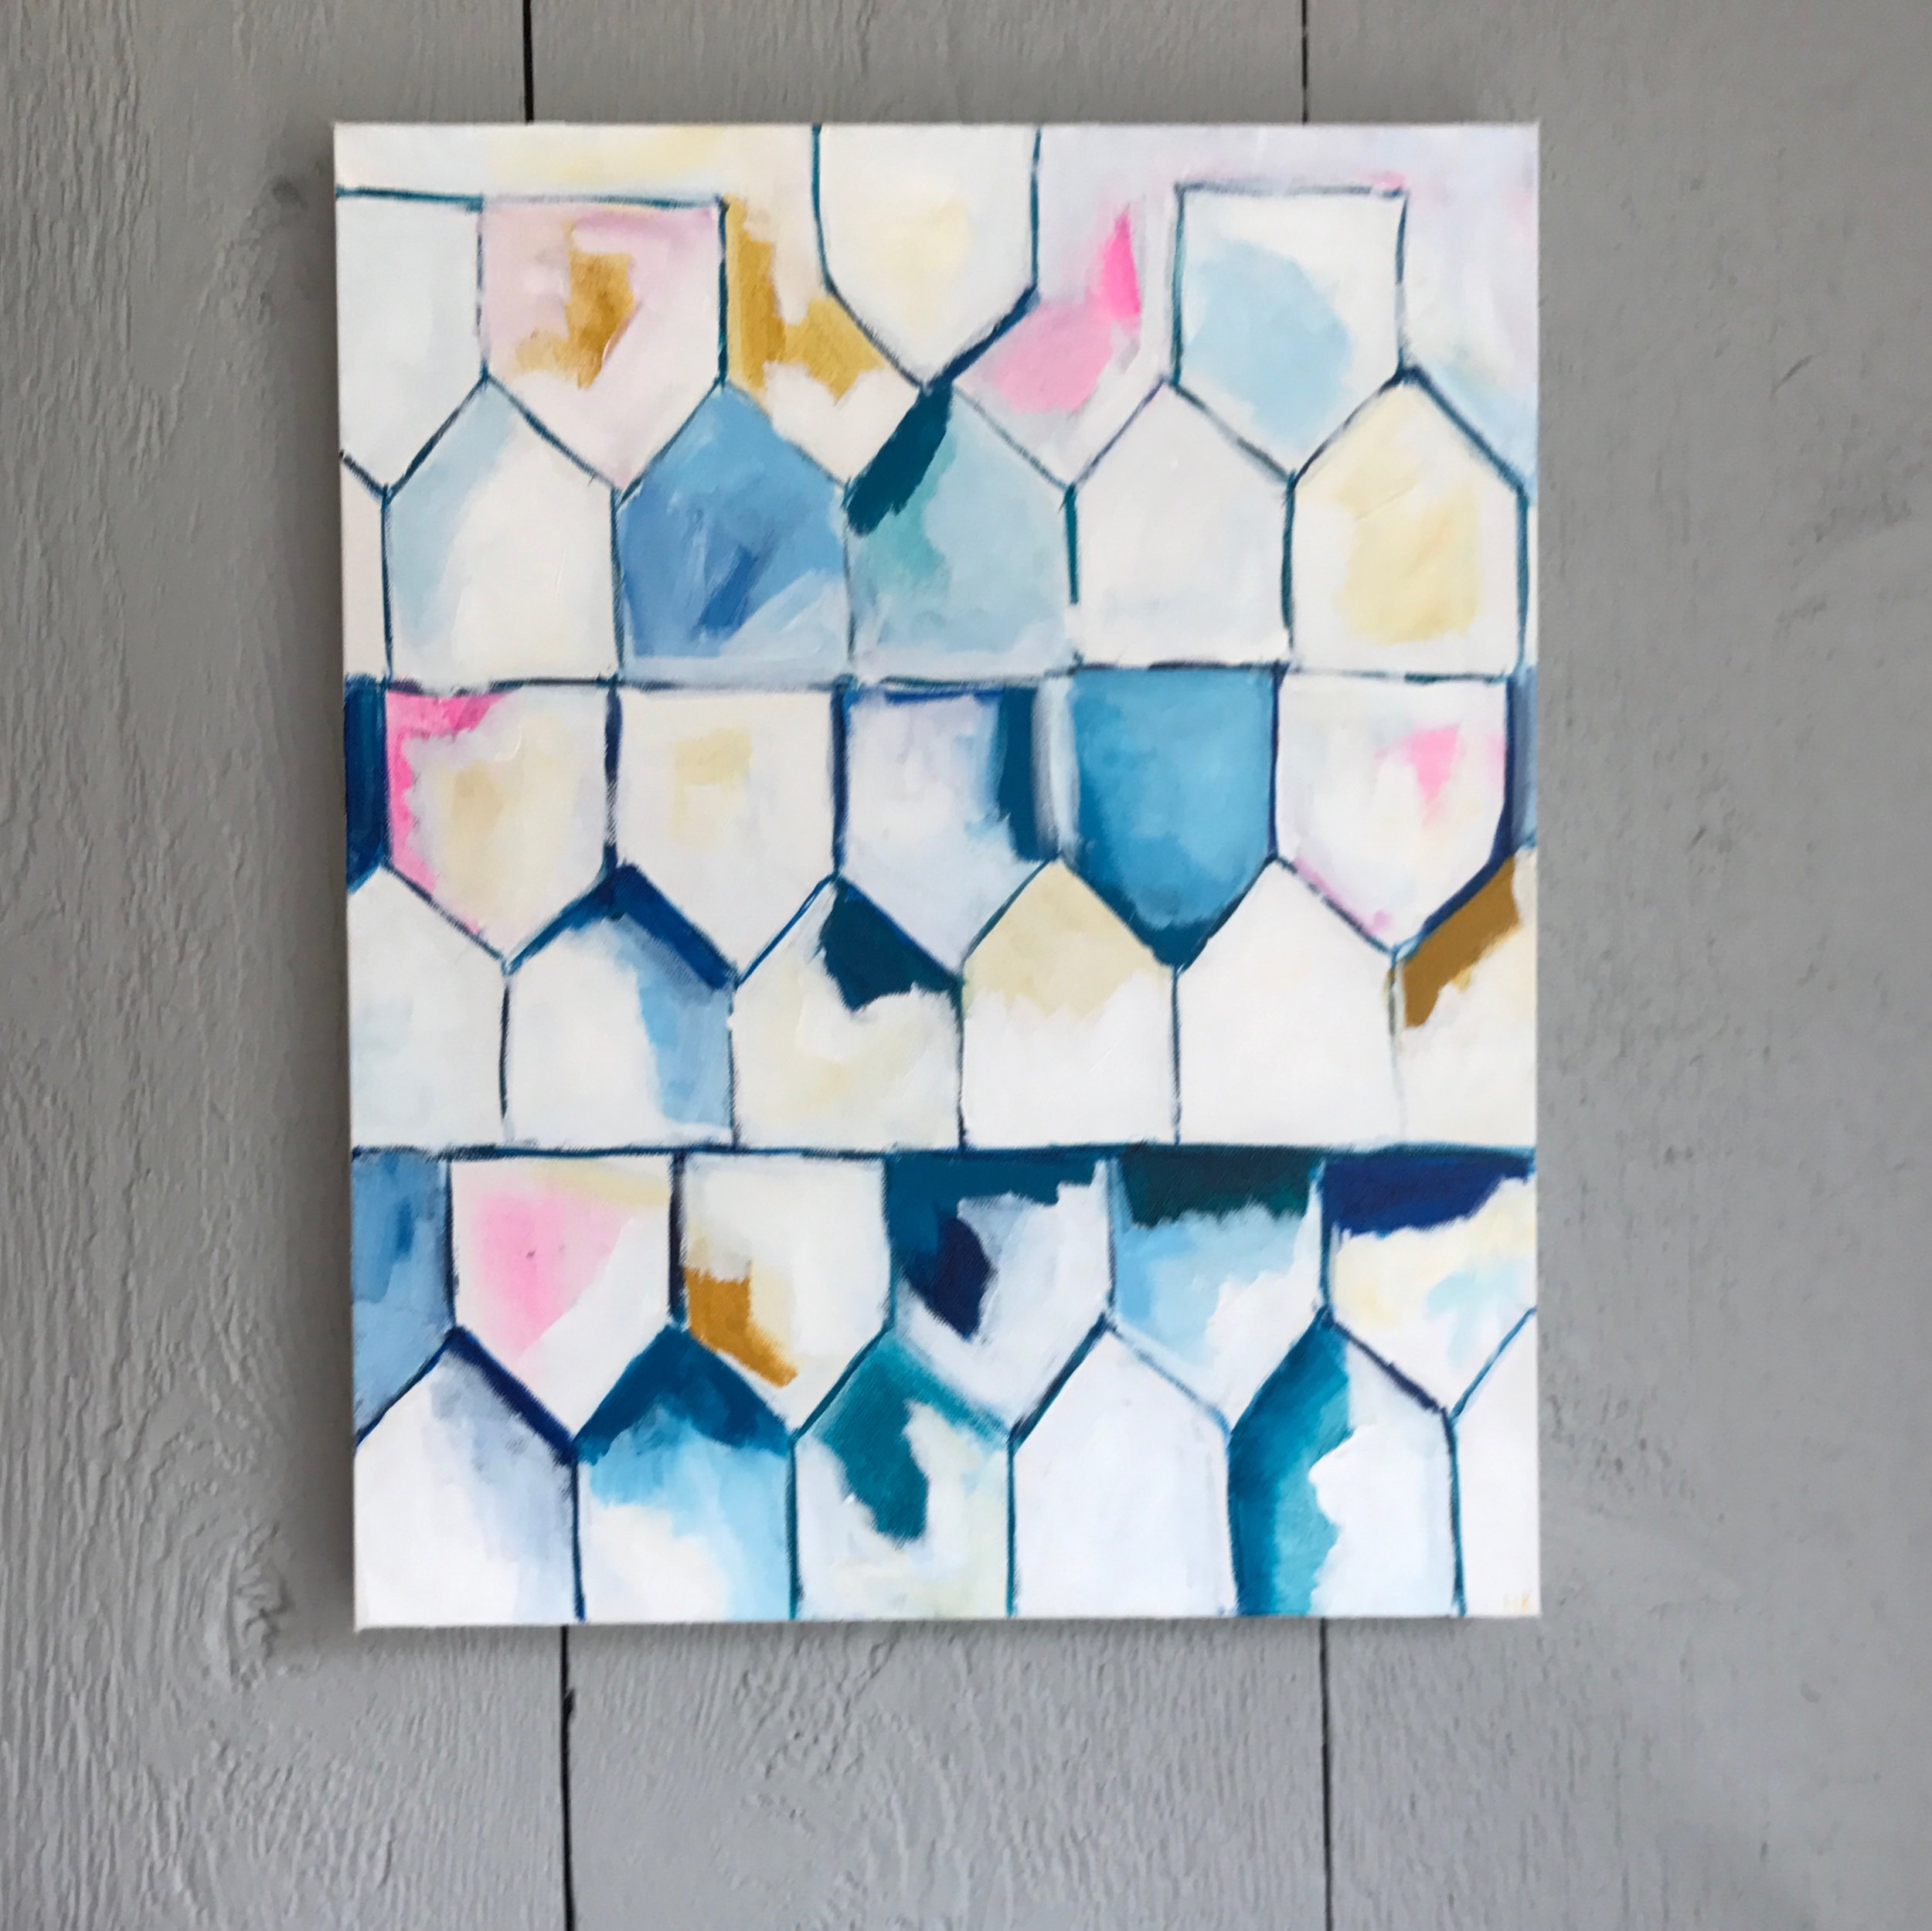 "COZY 16x20"" acrylic on canvas"